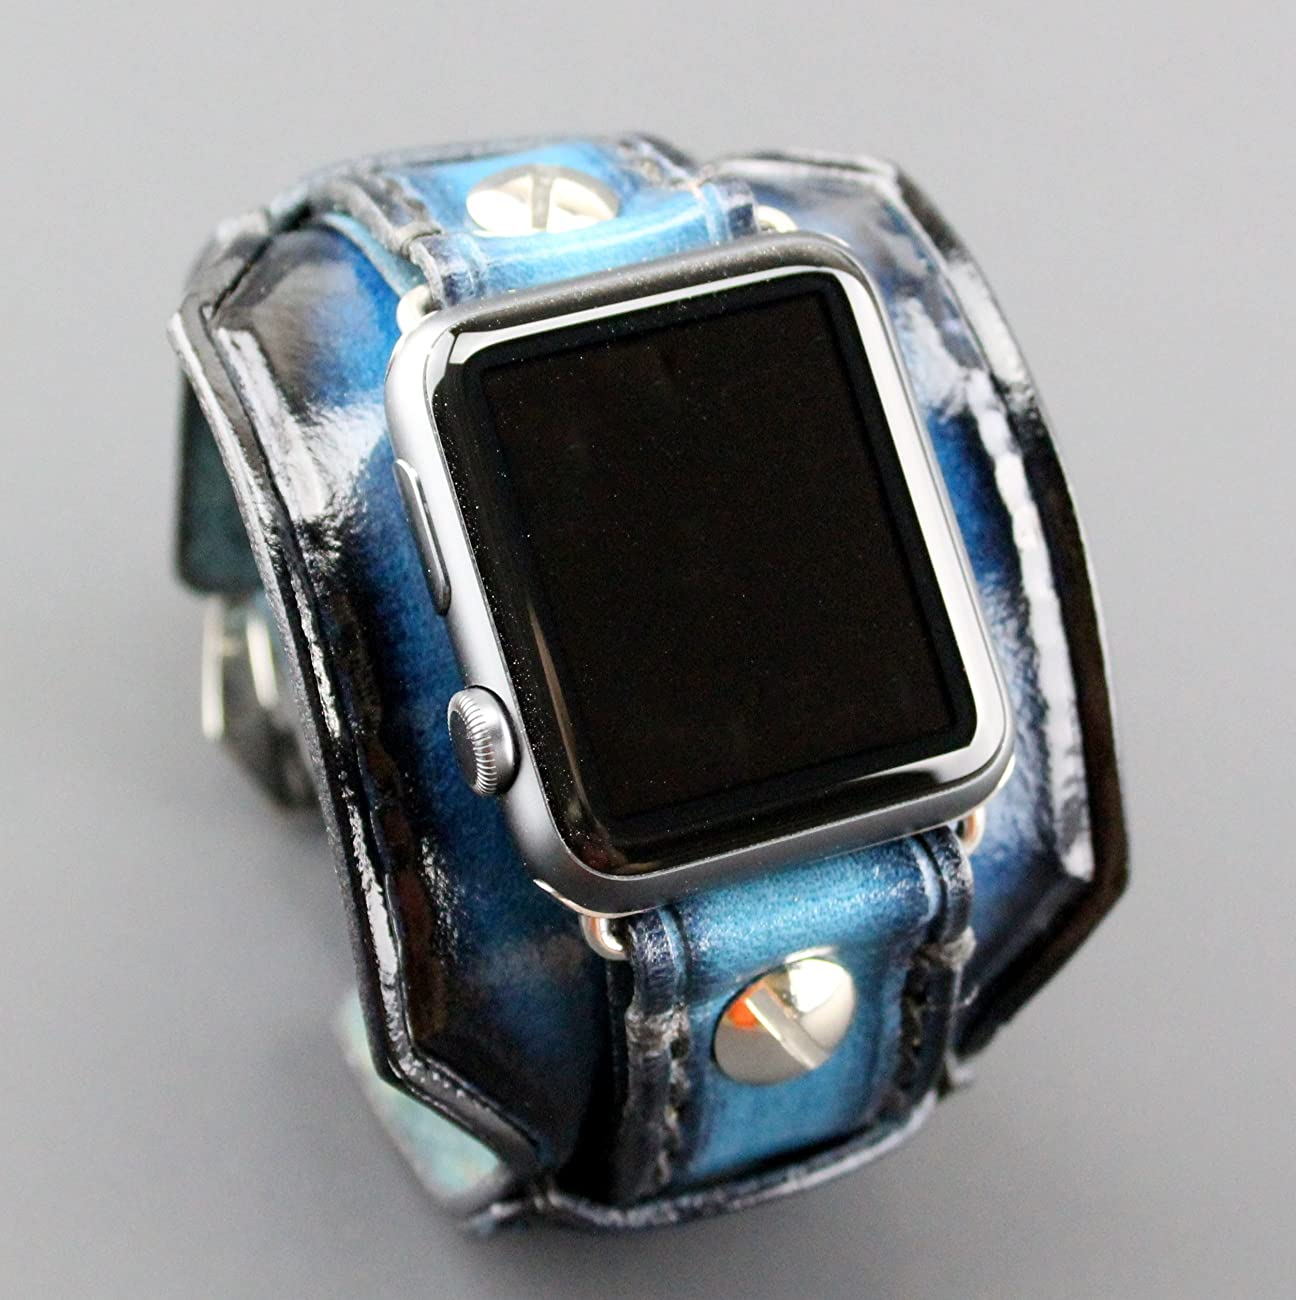 Blue Apple Watch Band, apple watch strap, Apple watch strap, Apple watch cuff, apple watch strap, apple watch 38 mm, apple watch 42mm 2